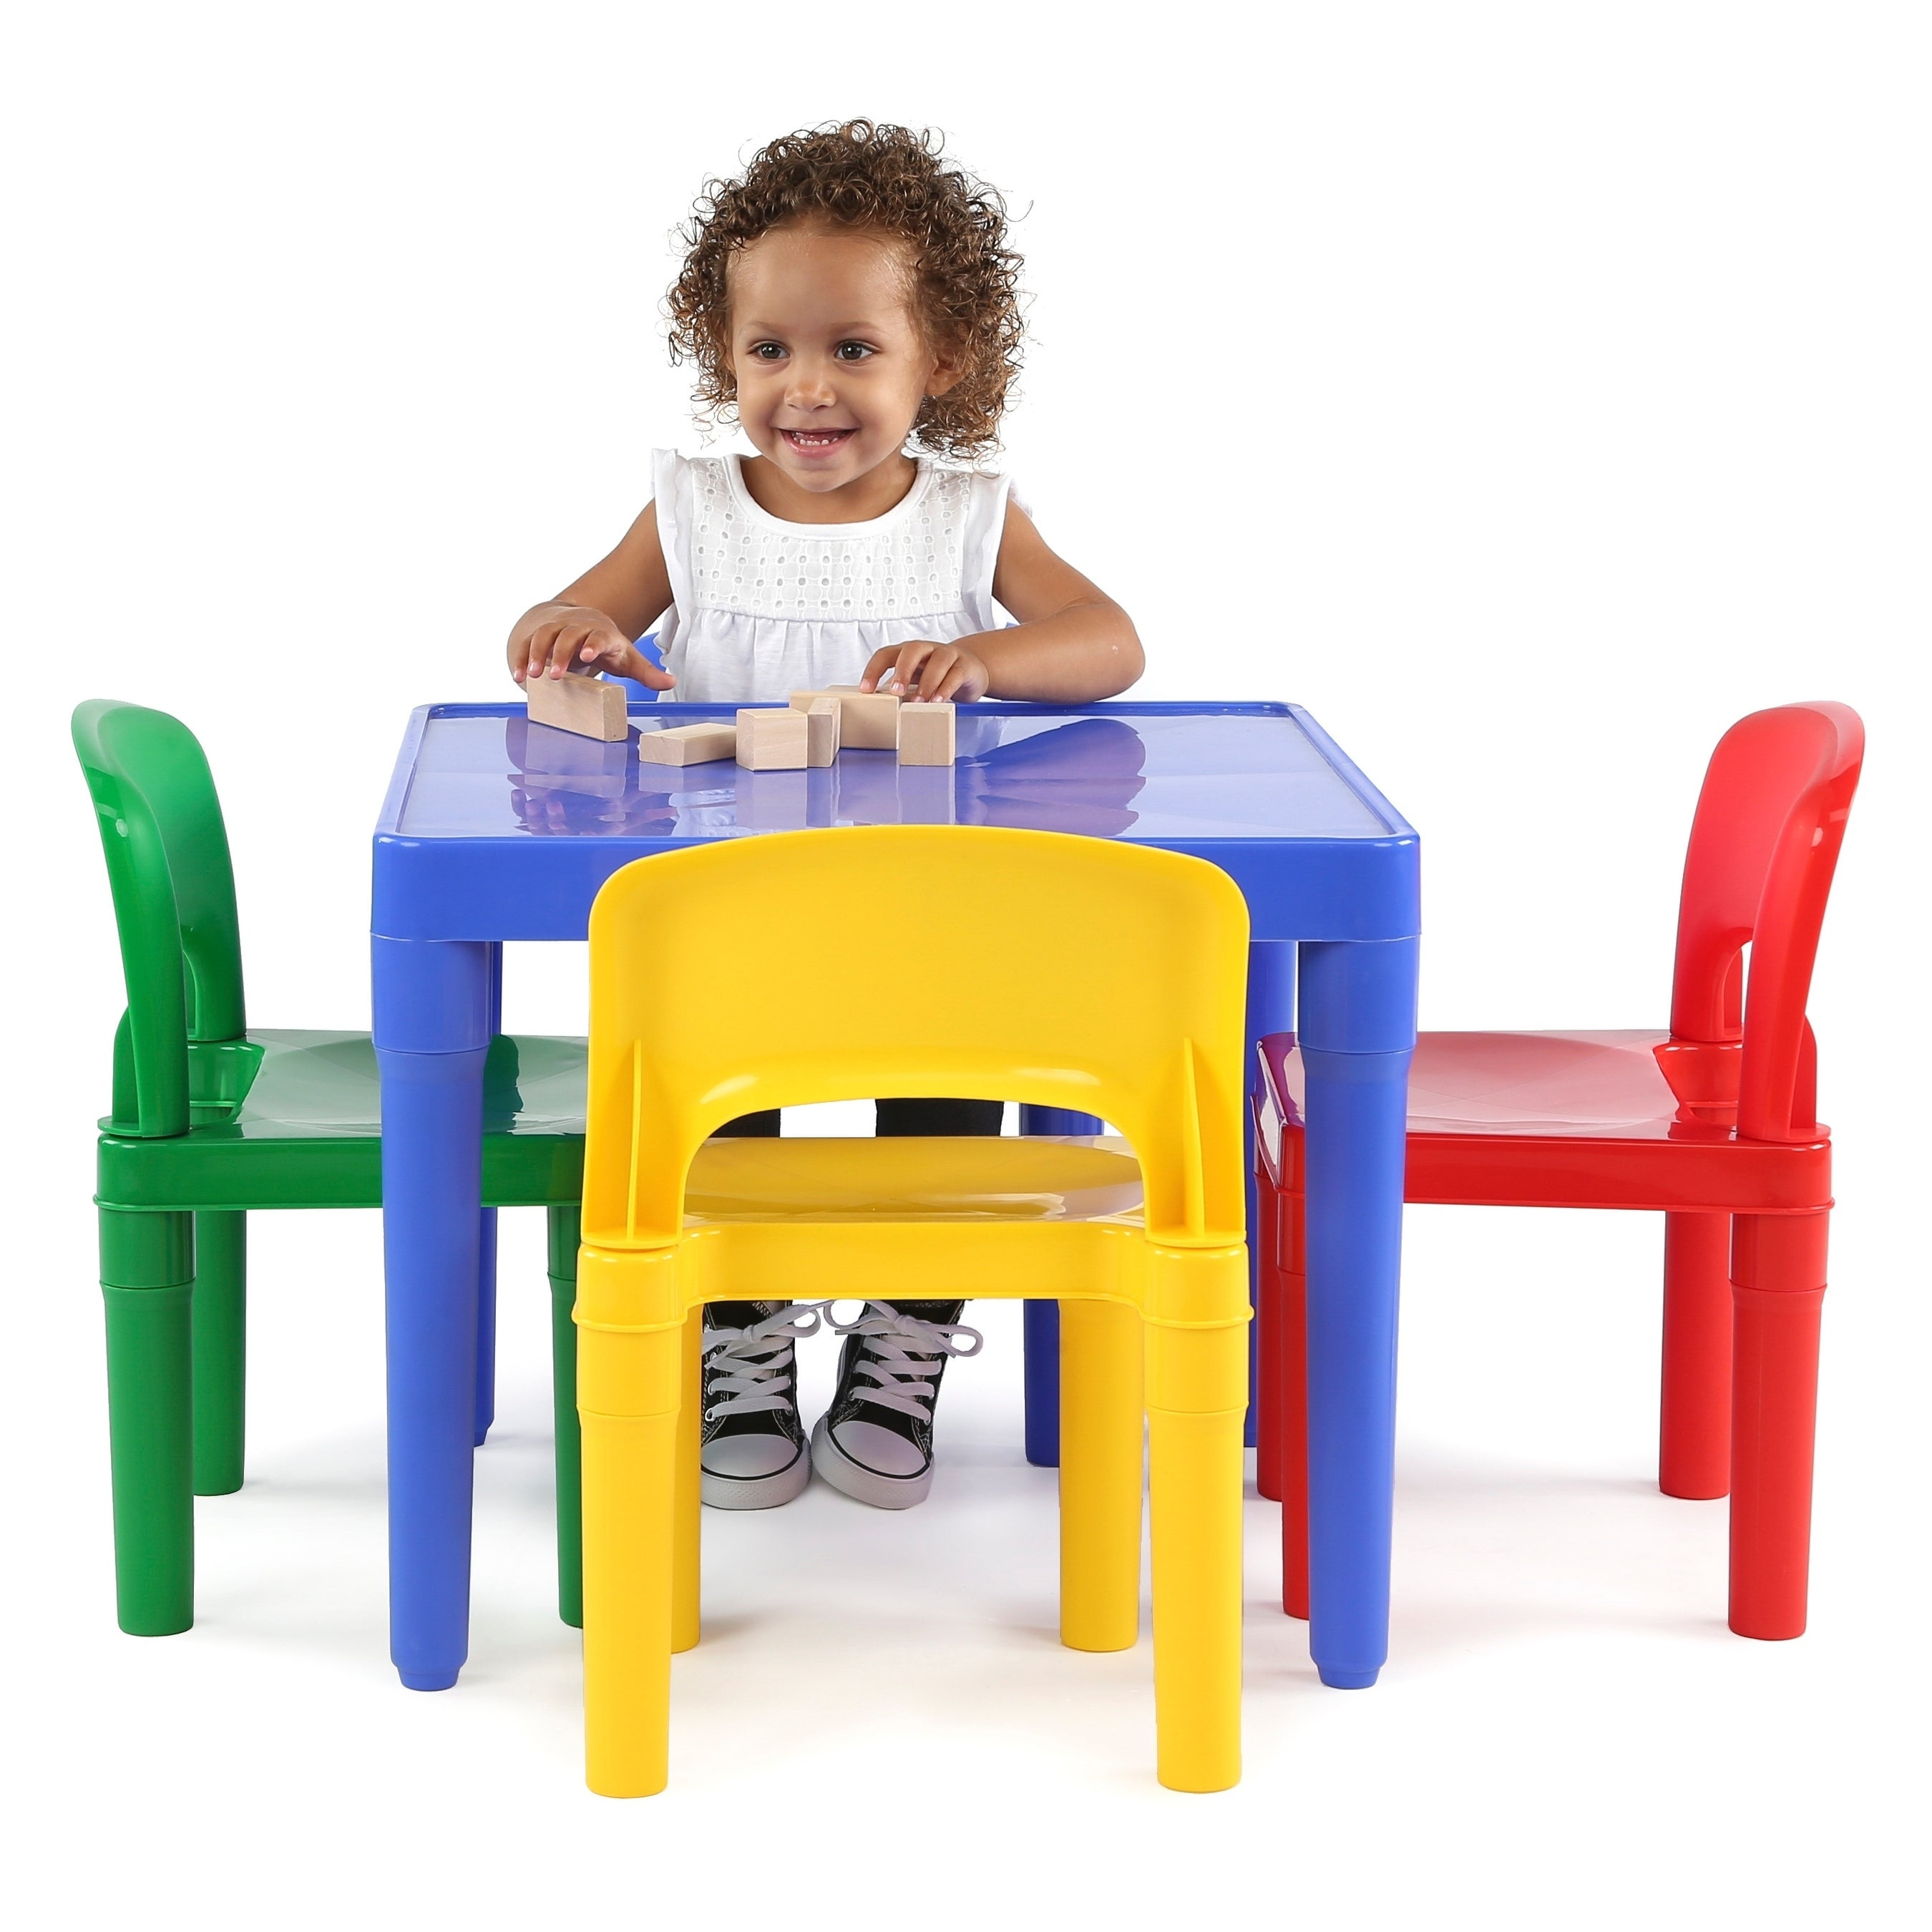 Shop Tot Tutors Kids Plastic Table and 4 Chairs Set, Vibrant Colors ...